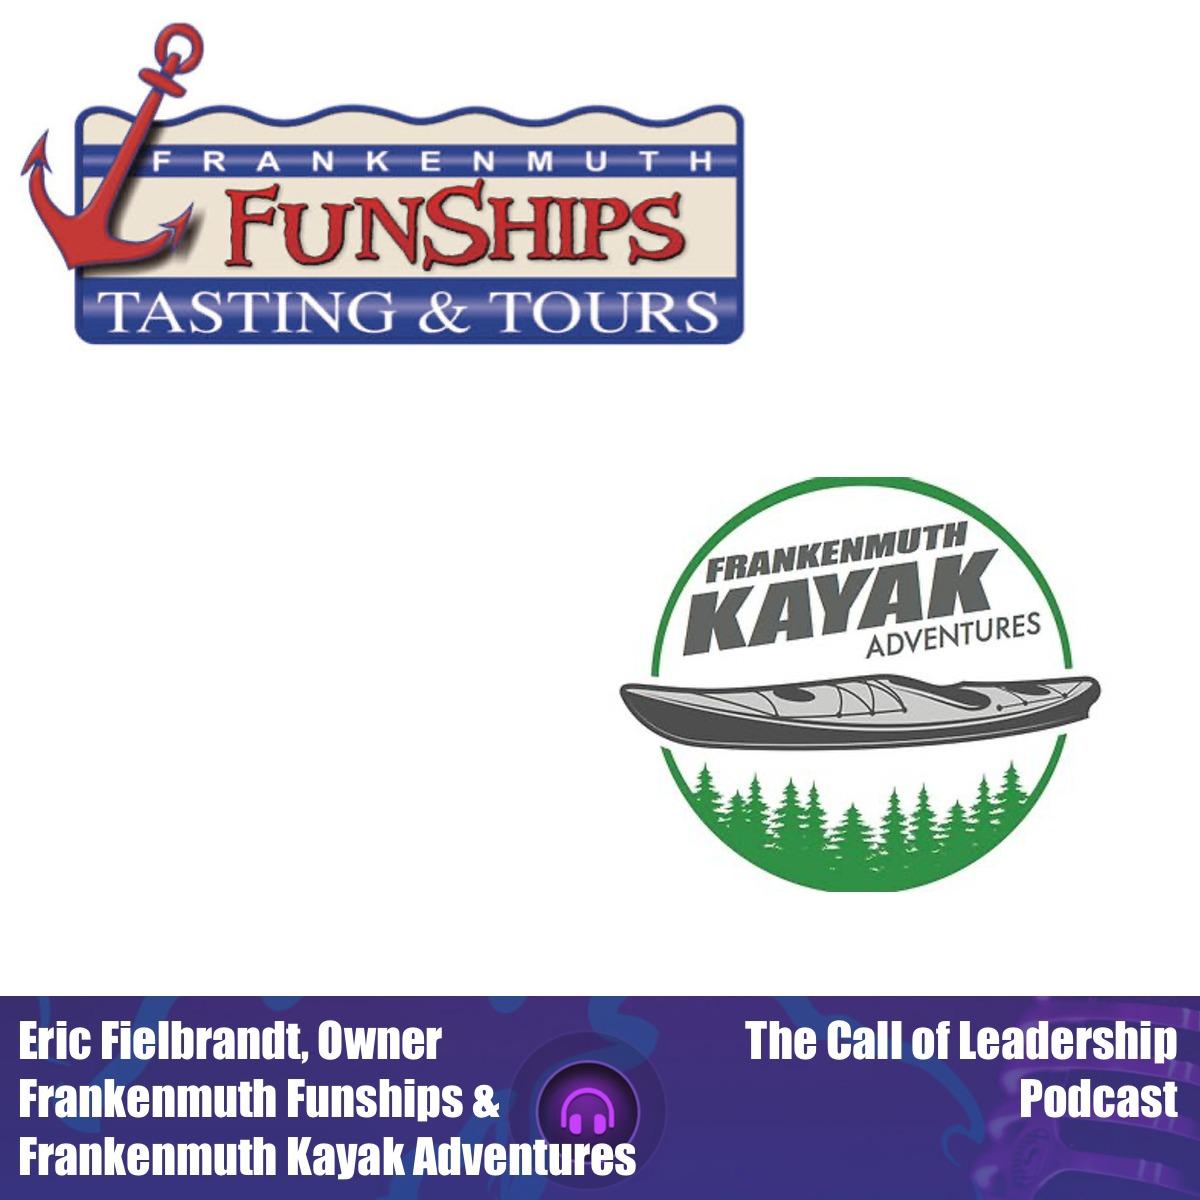 Frankenmuth Funships Eric Fiellbrandt